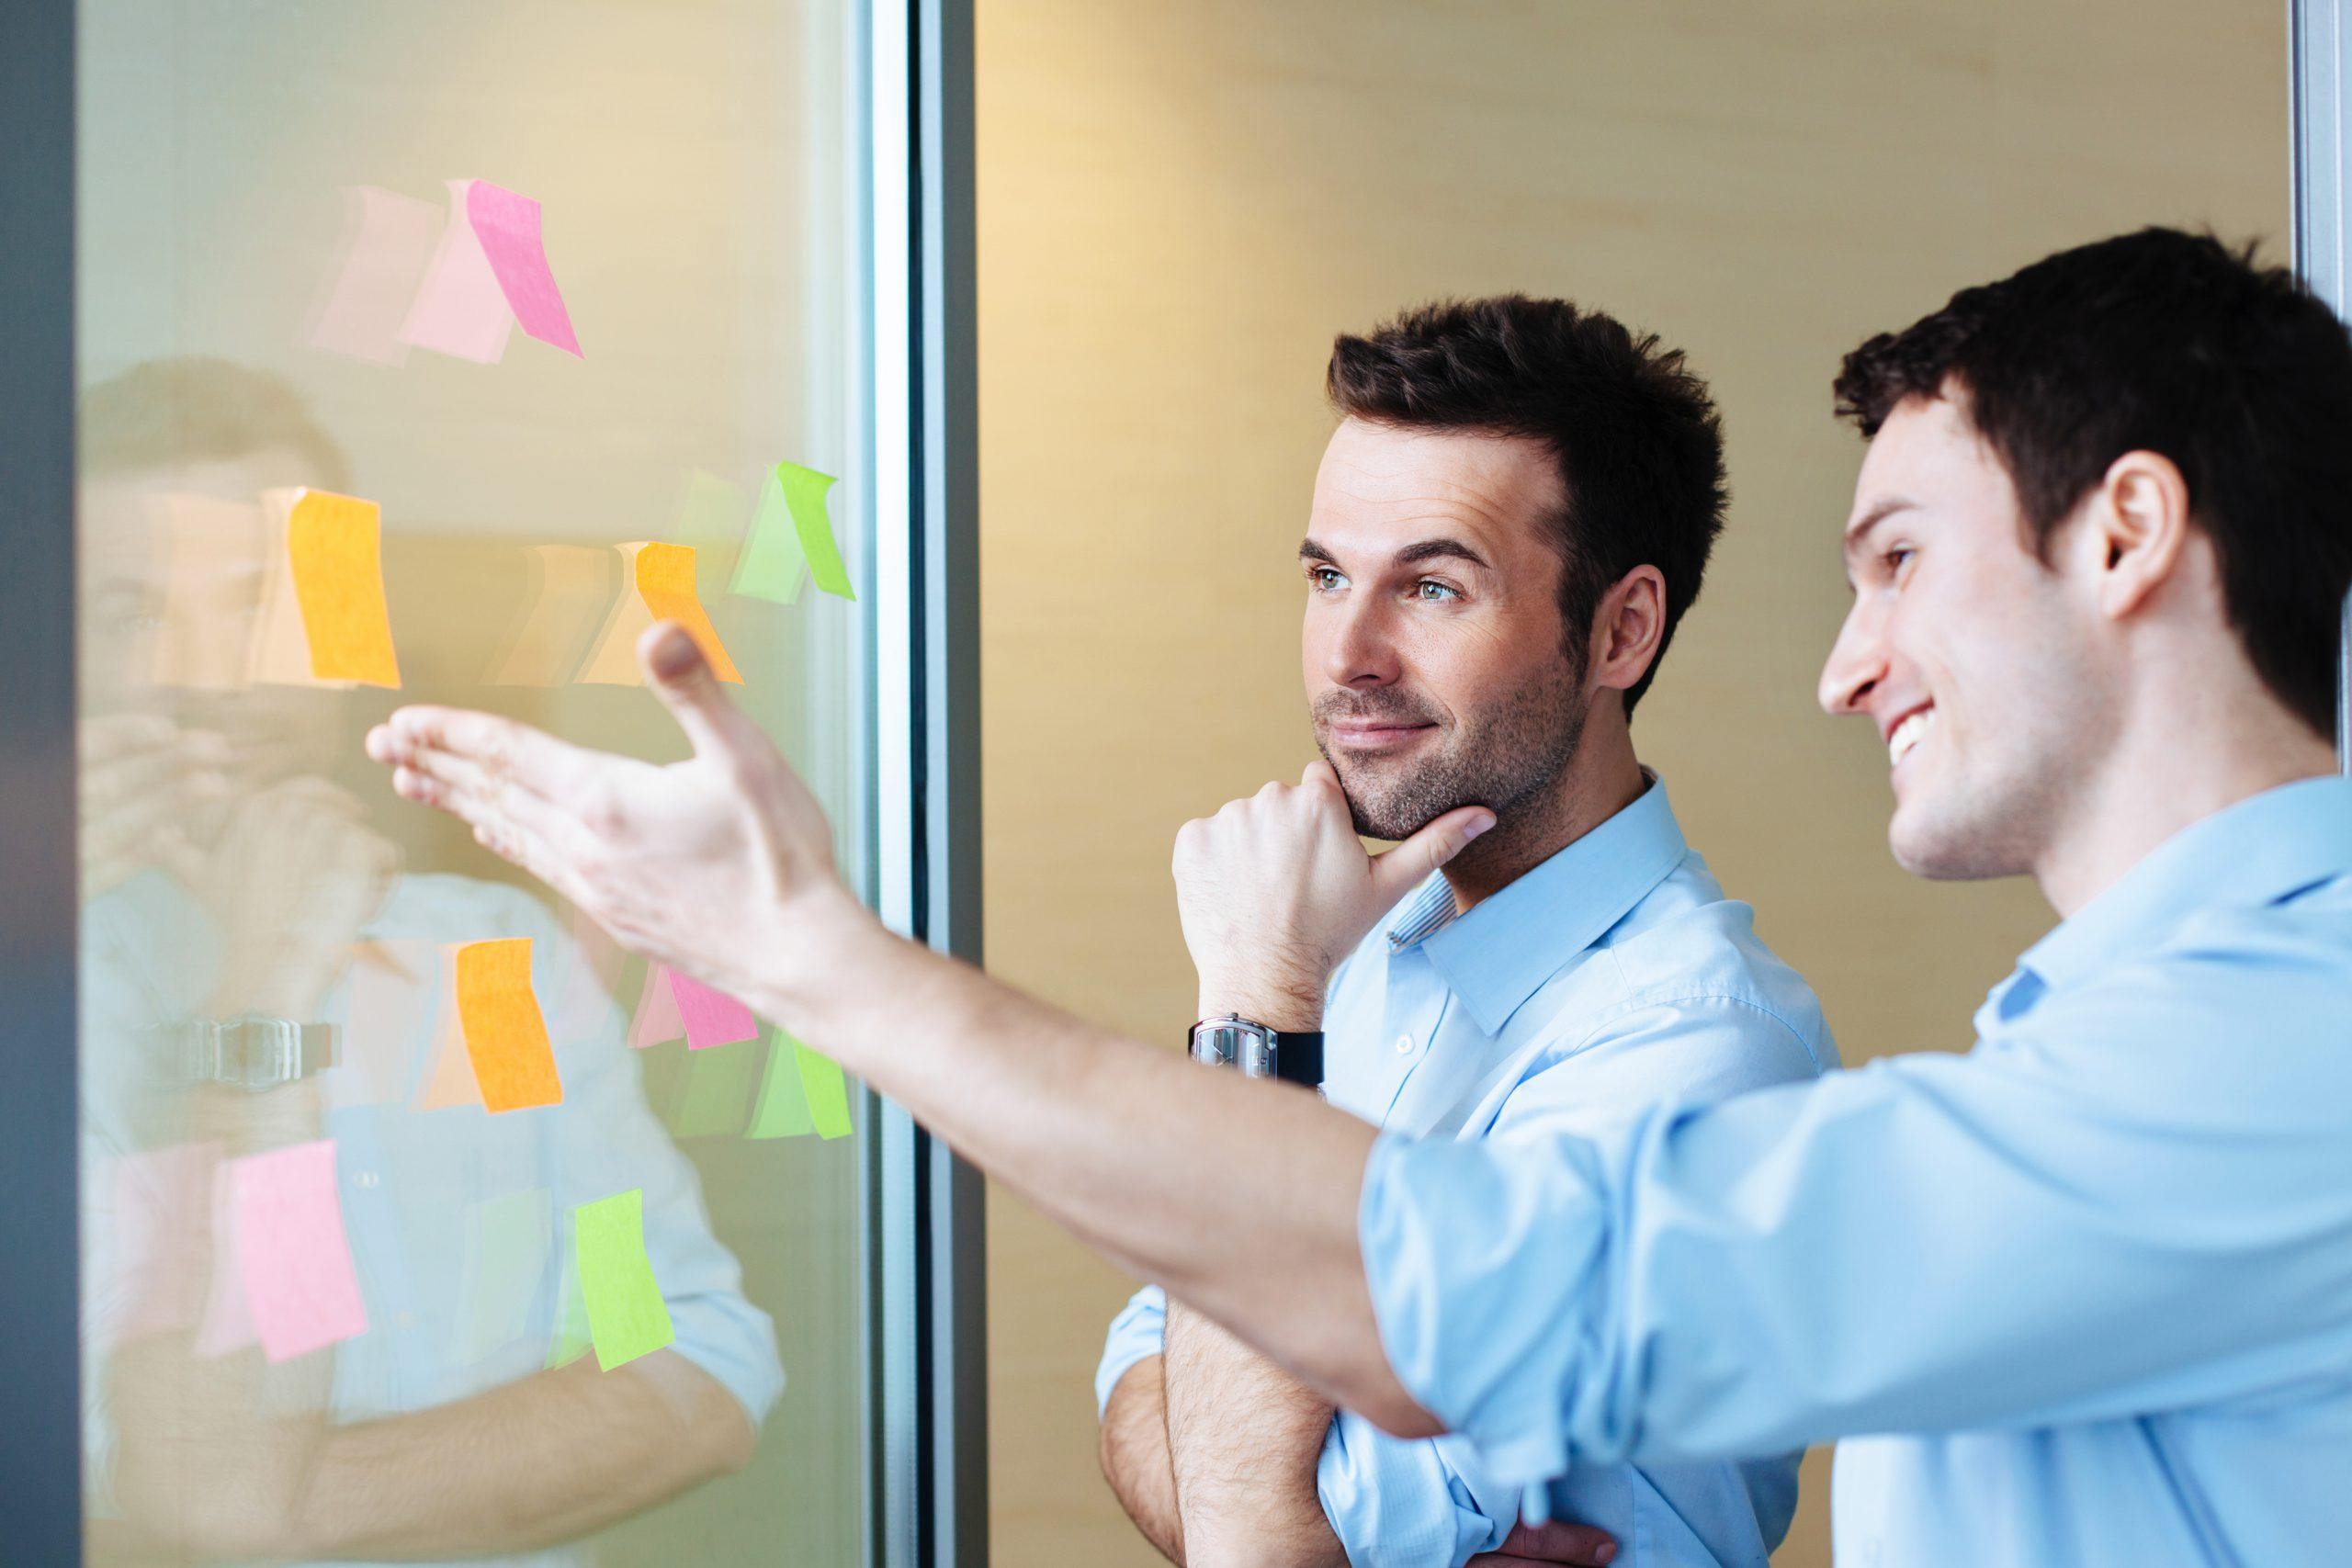 Finn ideen raskt – enkel workshop metode